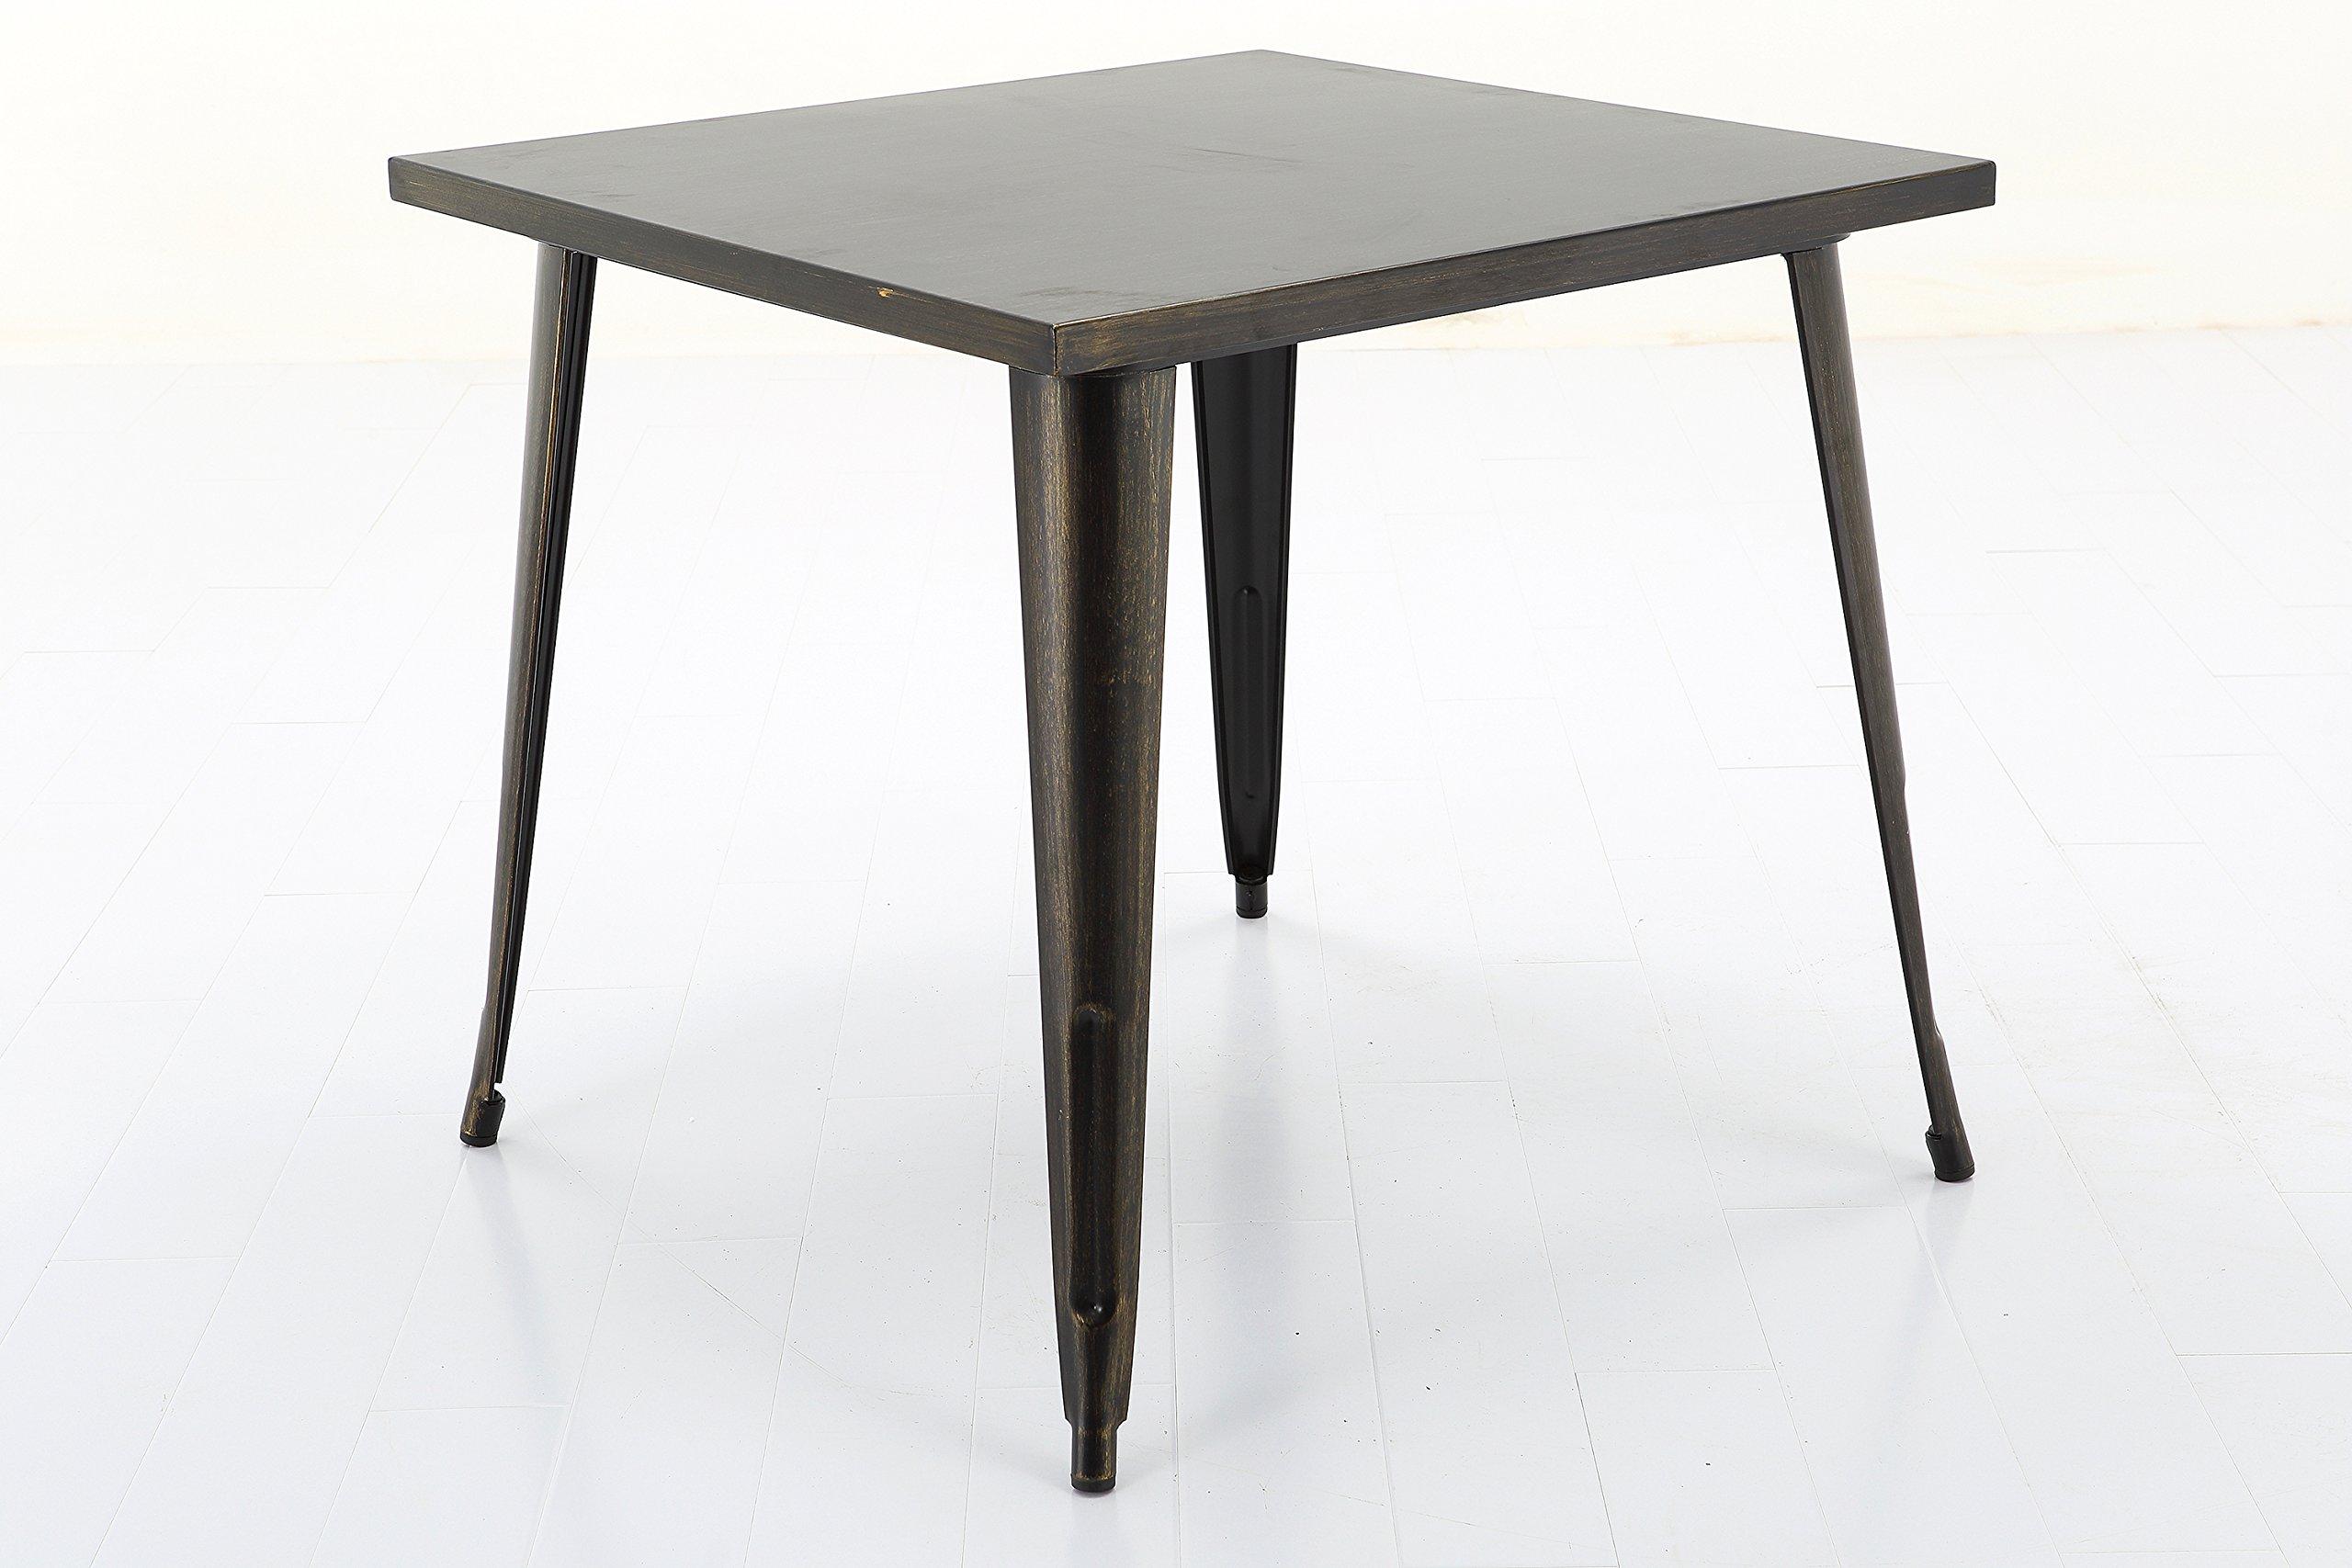 Vogue Furniture Direct Square Metal Bar/Dining Table - Antique BLACK+Gold Square VF1581036